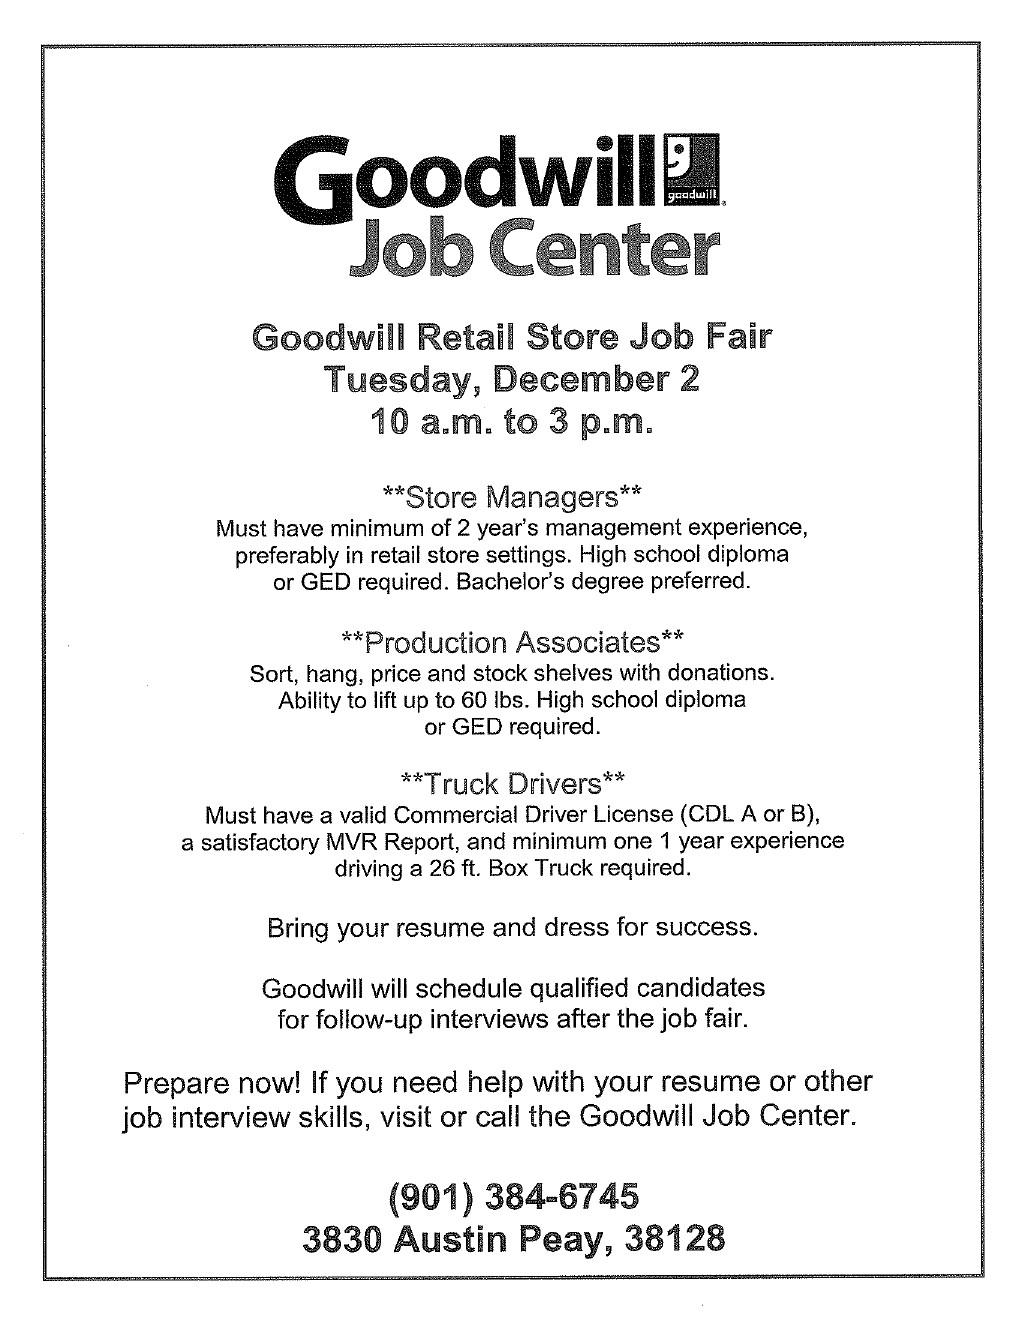 Job Fairs Job Career News From The Memphis Public Libraries